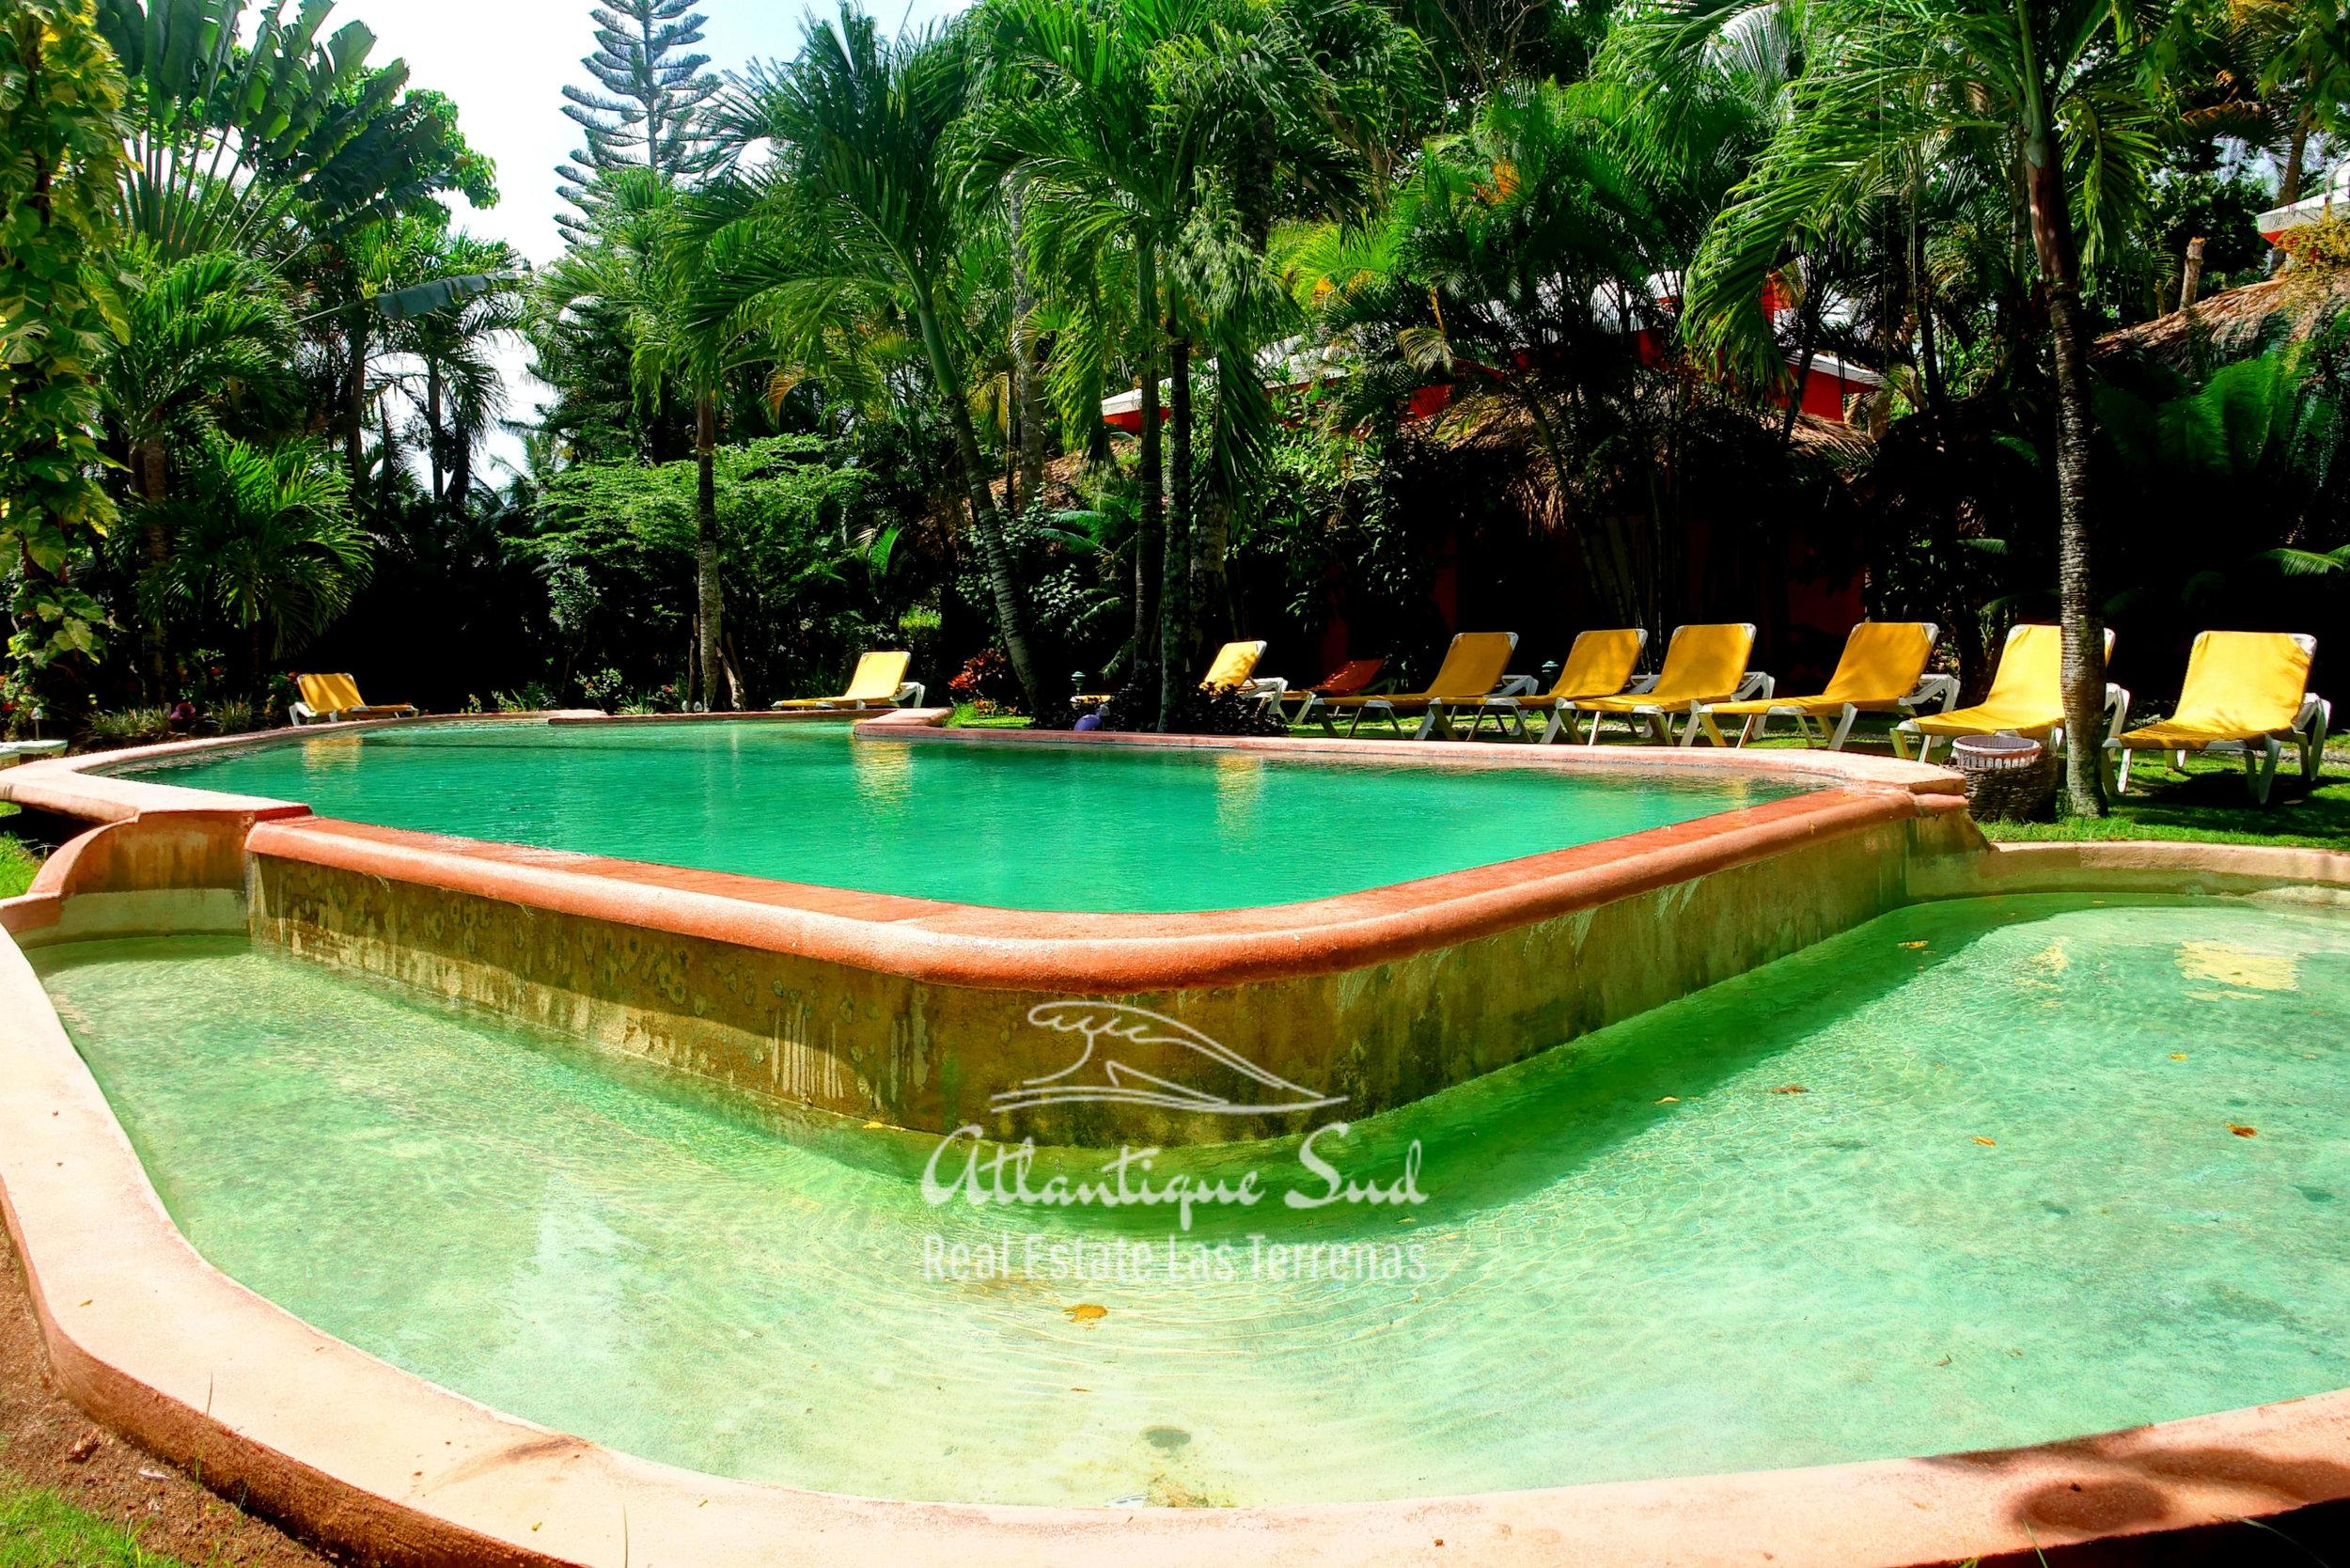 Colourful caribbean hotel in touristic heart Real Estate Las Terrenas Dominican Republic2.jpg